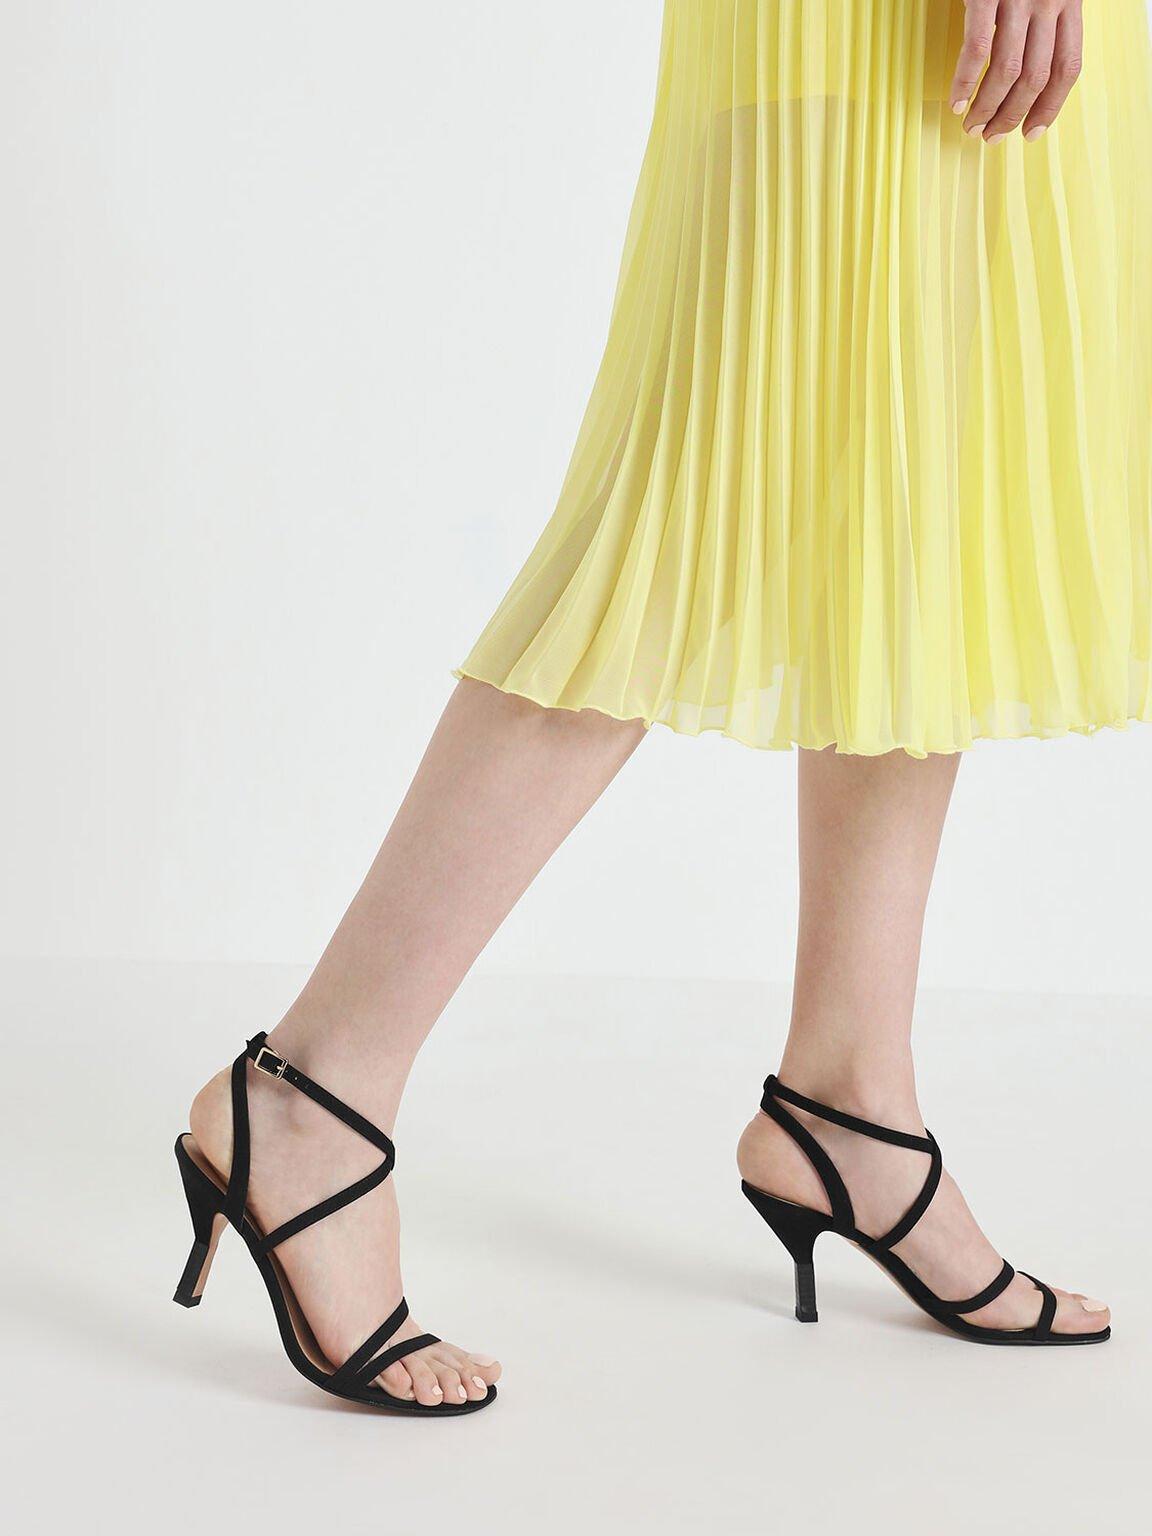 Strappy Blade Heel Sandals, Black, hi-res